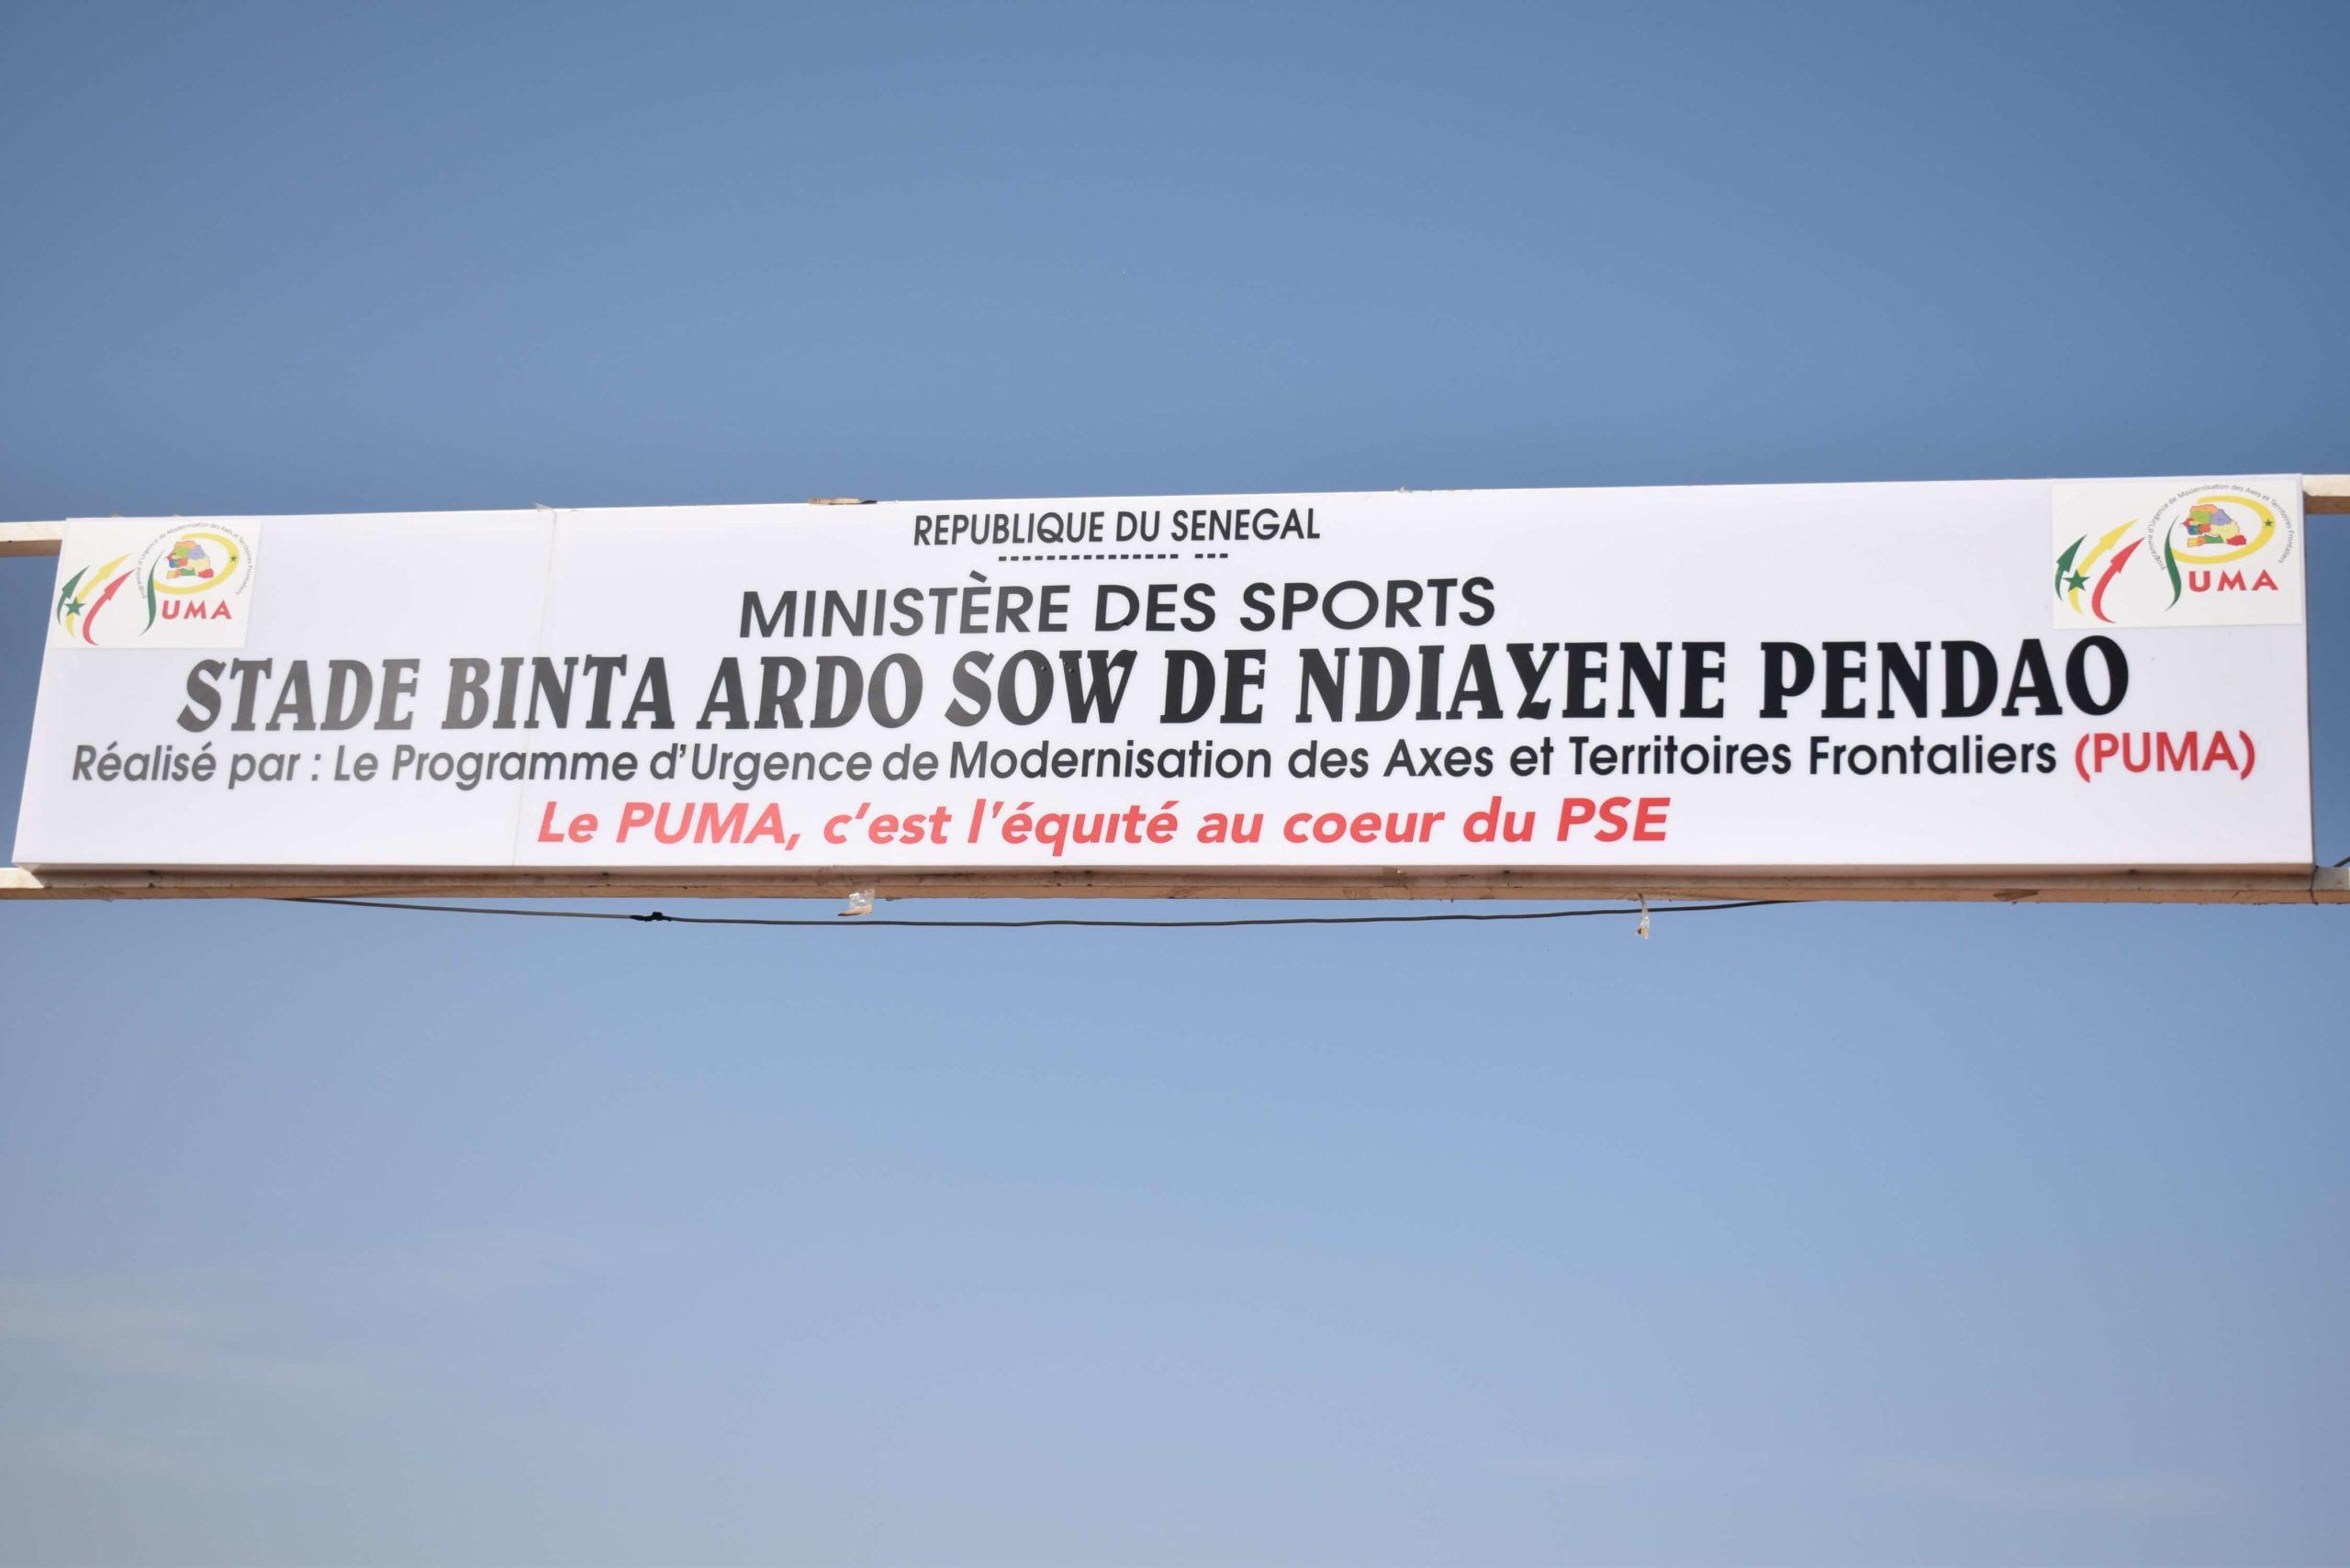 Inauguration par le PUMA du terrain multifonctionnel de « Binta Ardo Sow » de NDIAYENE PENDAO à PODOR